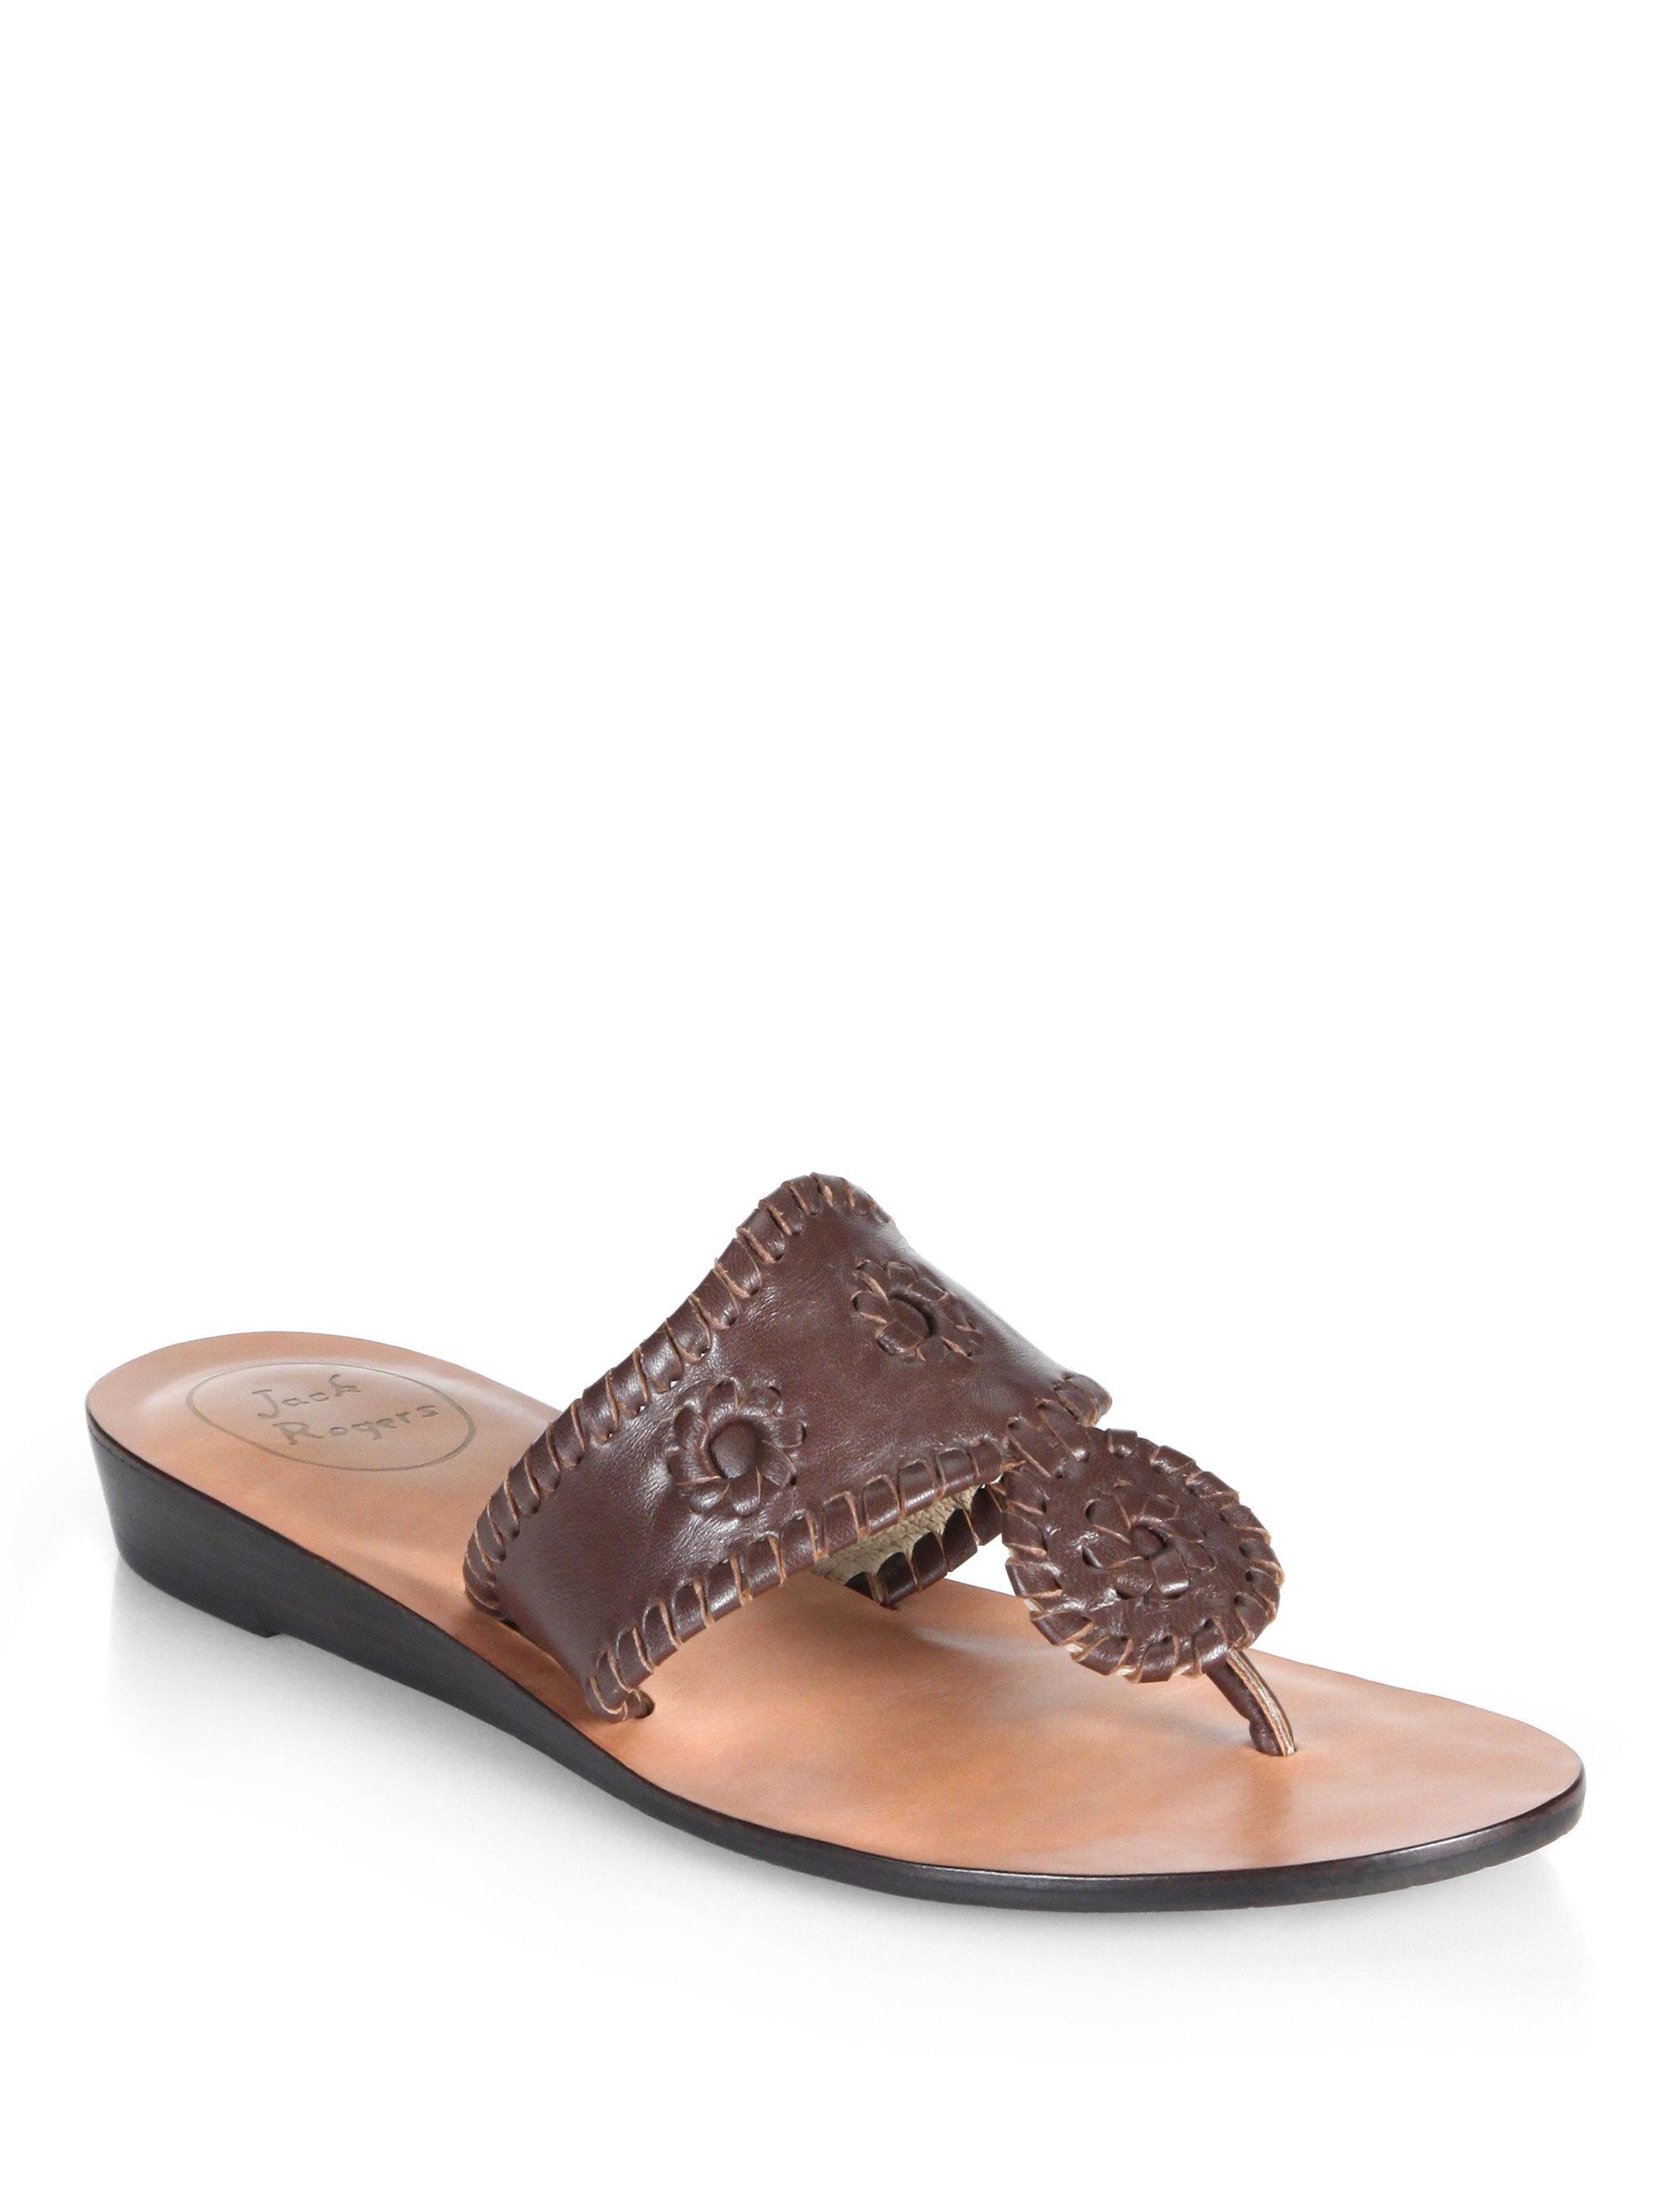 Jack Rogers Capri Leather Mid-Wedge Sandals tMao9aZdc